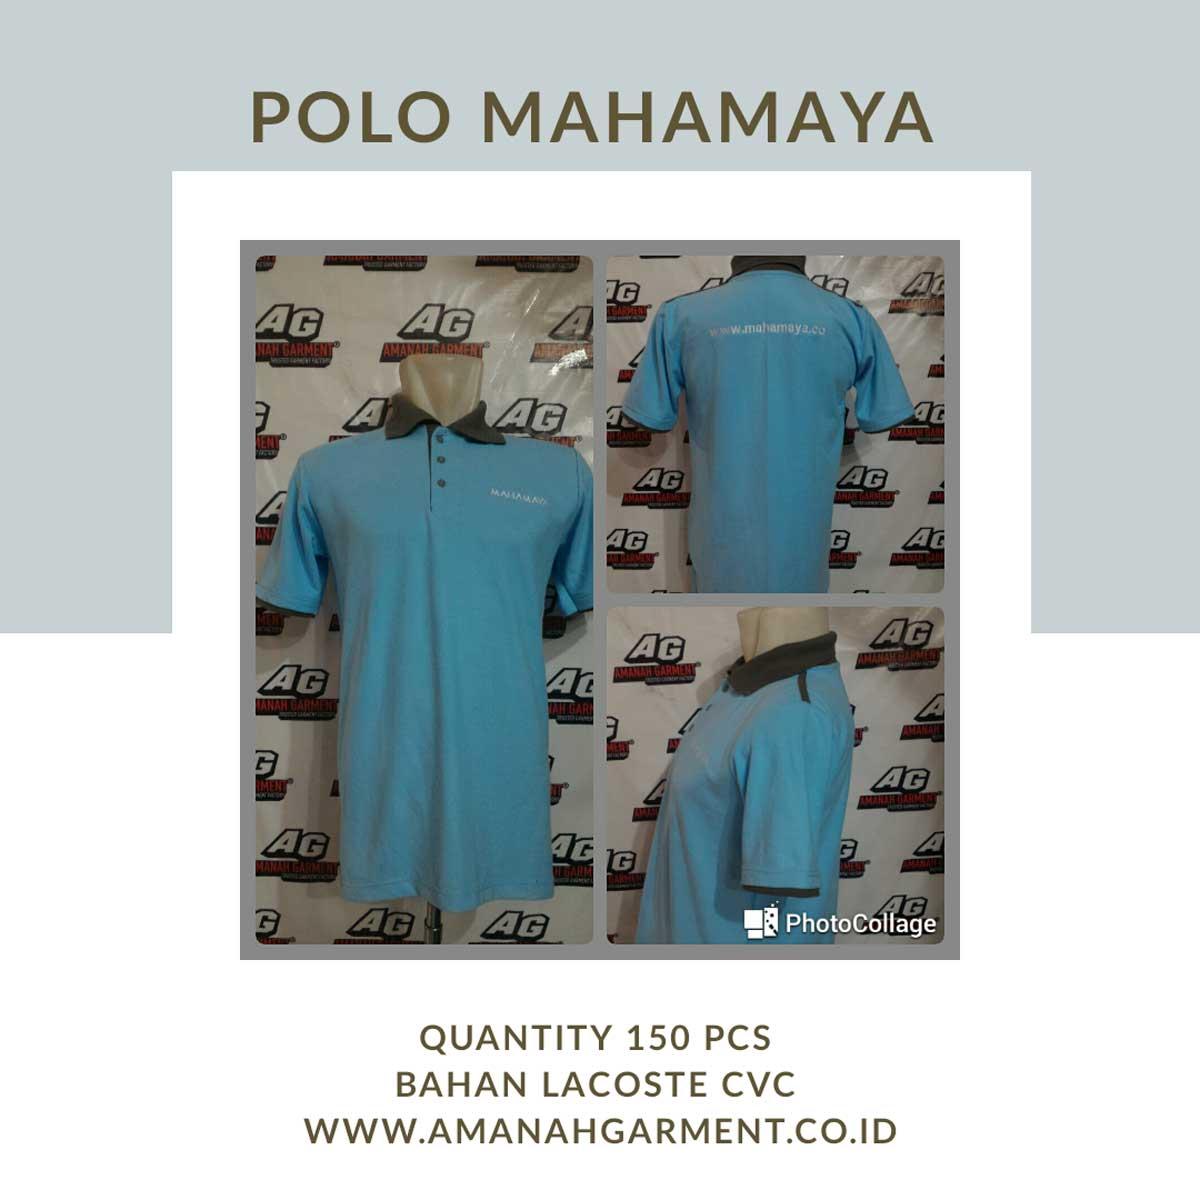 Jual Kaos Polo Yogyakarta, Jual Kaos Polo Di Jogja, Jual Kaos Polos Anak Jogja